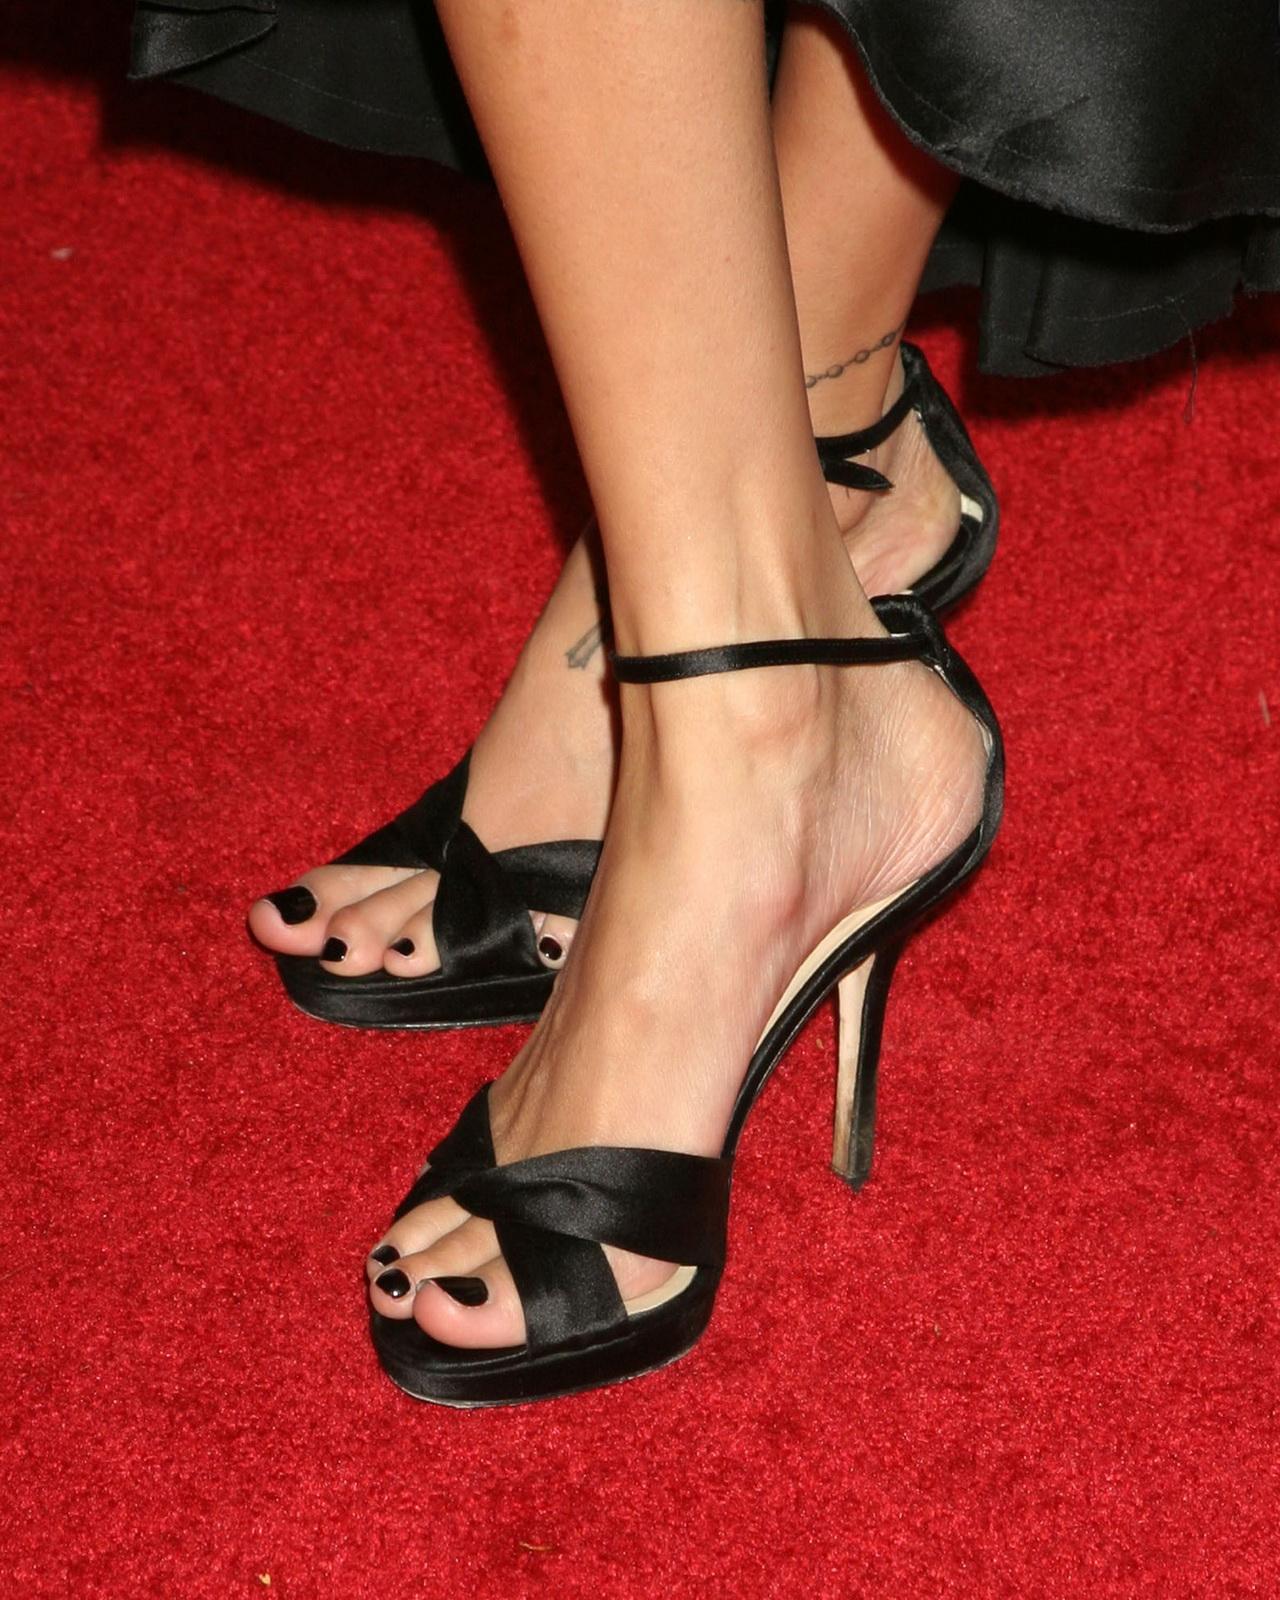 http://4.bp.blogspot.com/_UaLWp72nij4/TBqJZIUjTaI/AAAAAAAAPXE/328fnOD7djE/s1600/nicole-richie-feet-3.jpg